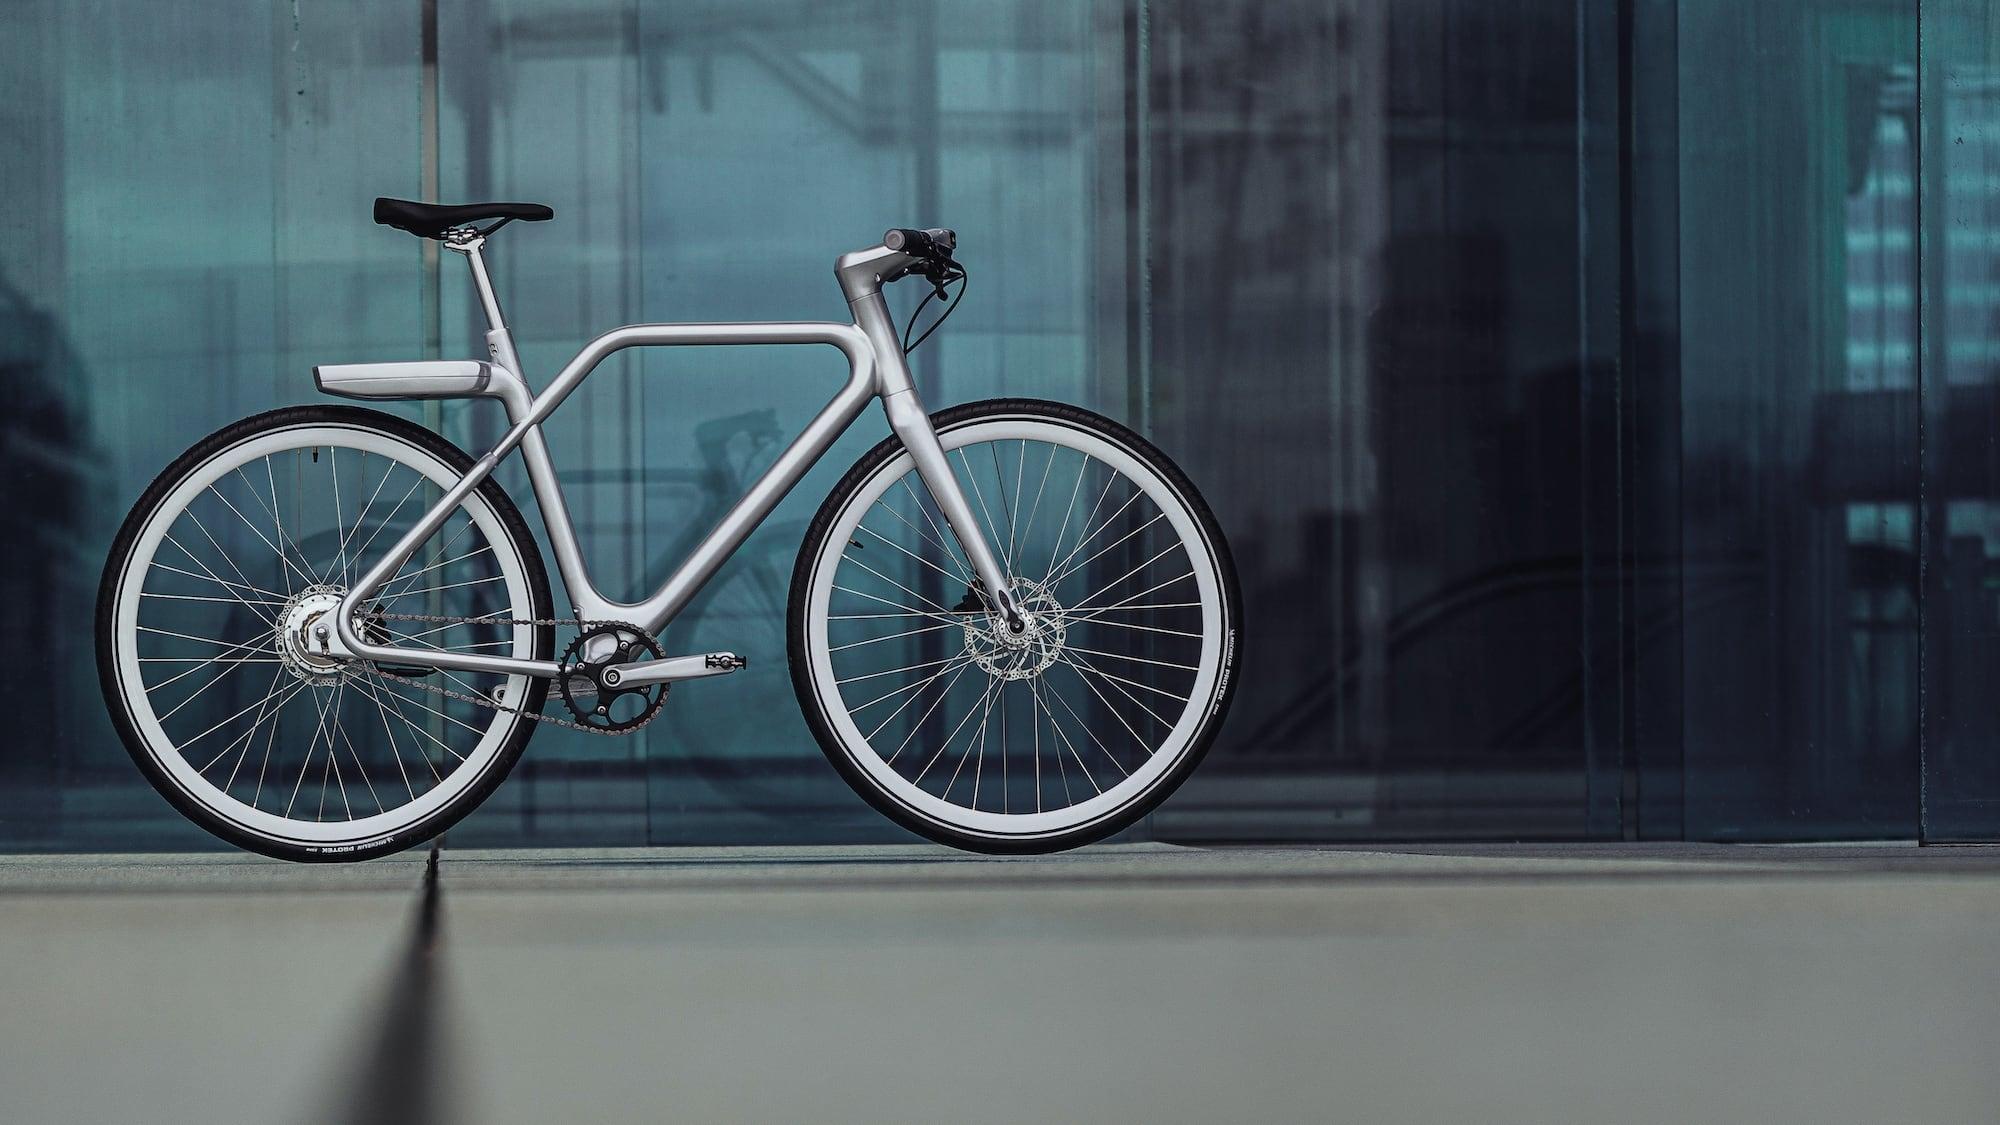 Angell Luxurious Electric Bike